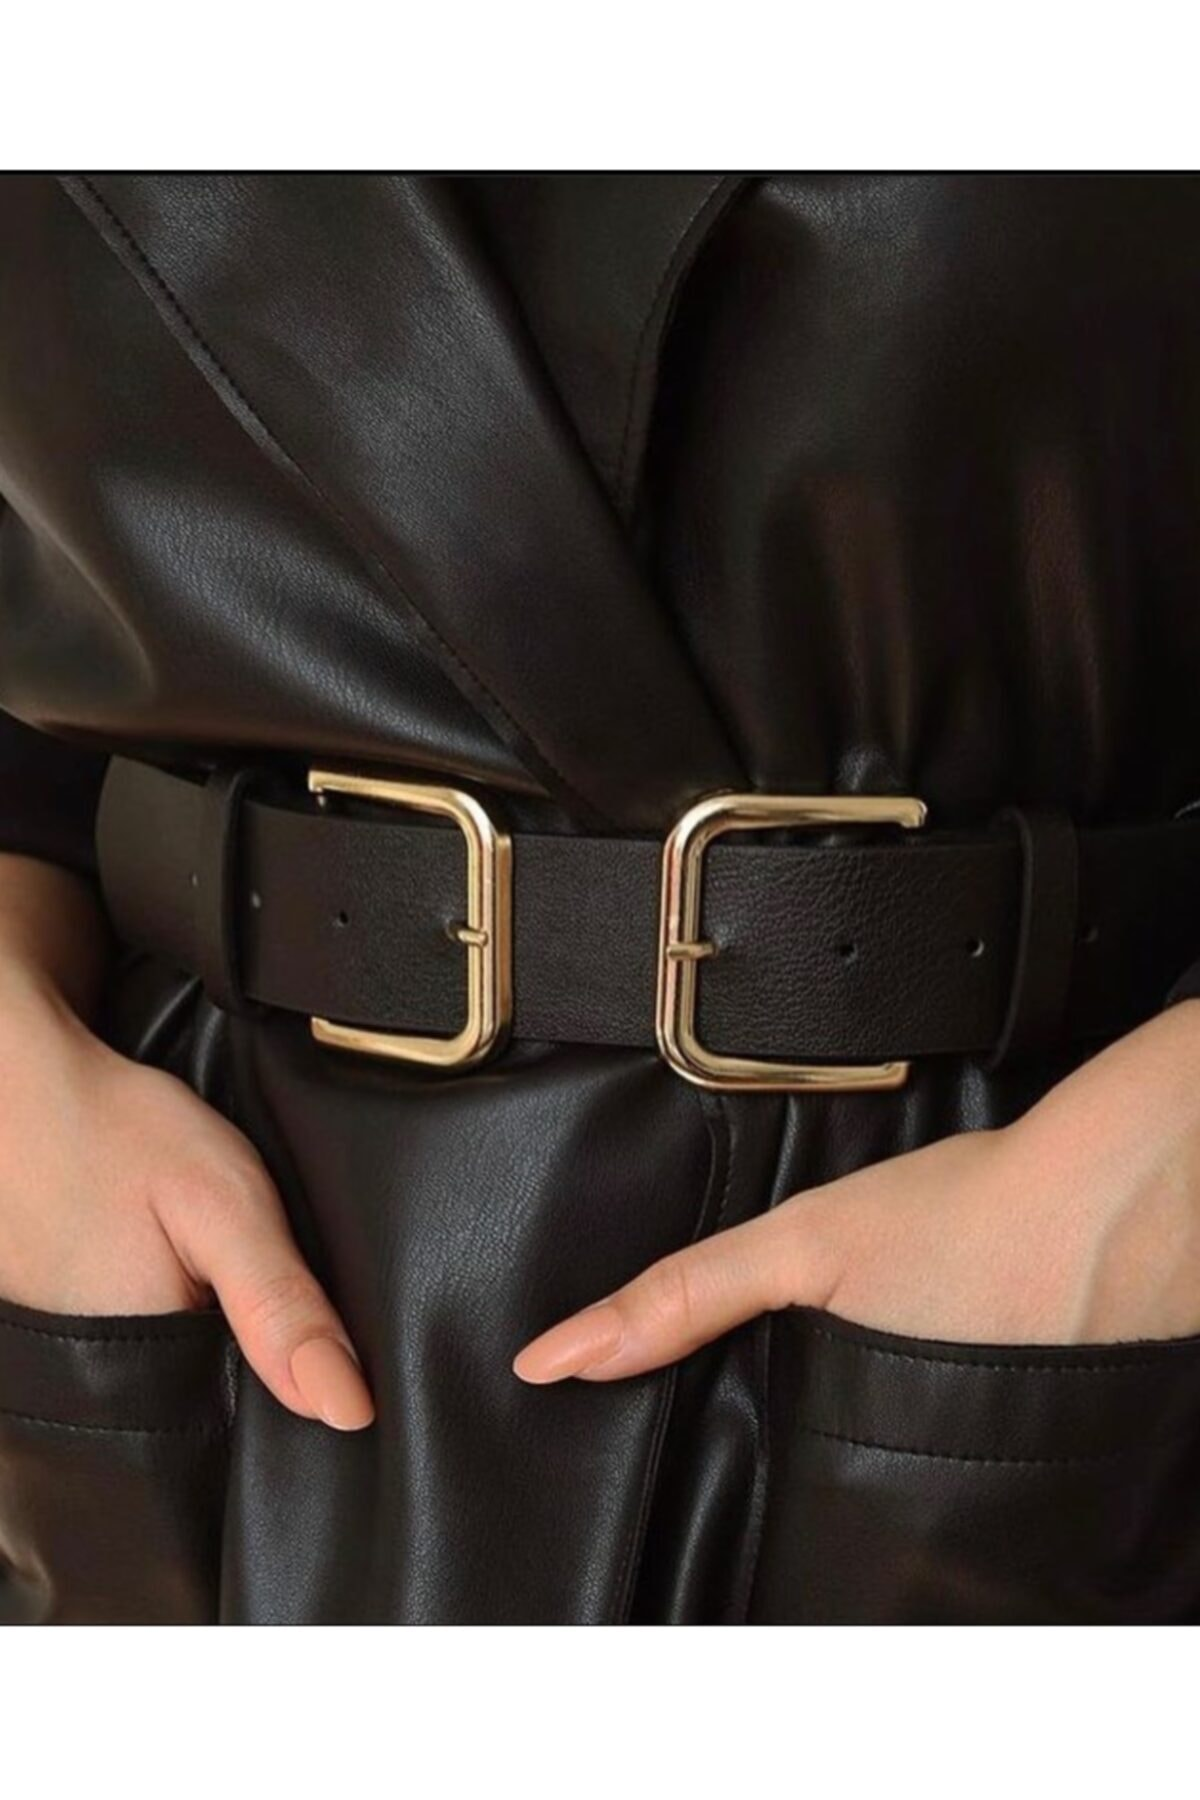 Kadın Siyah Çift Tokalı Kemer R5099m